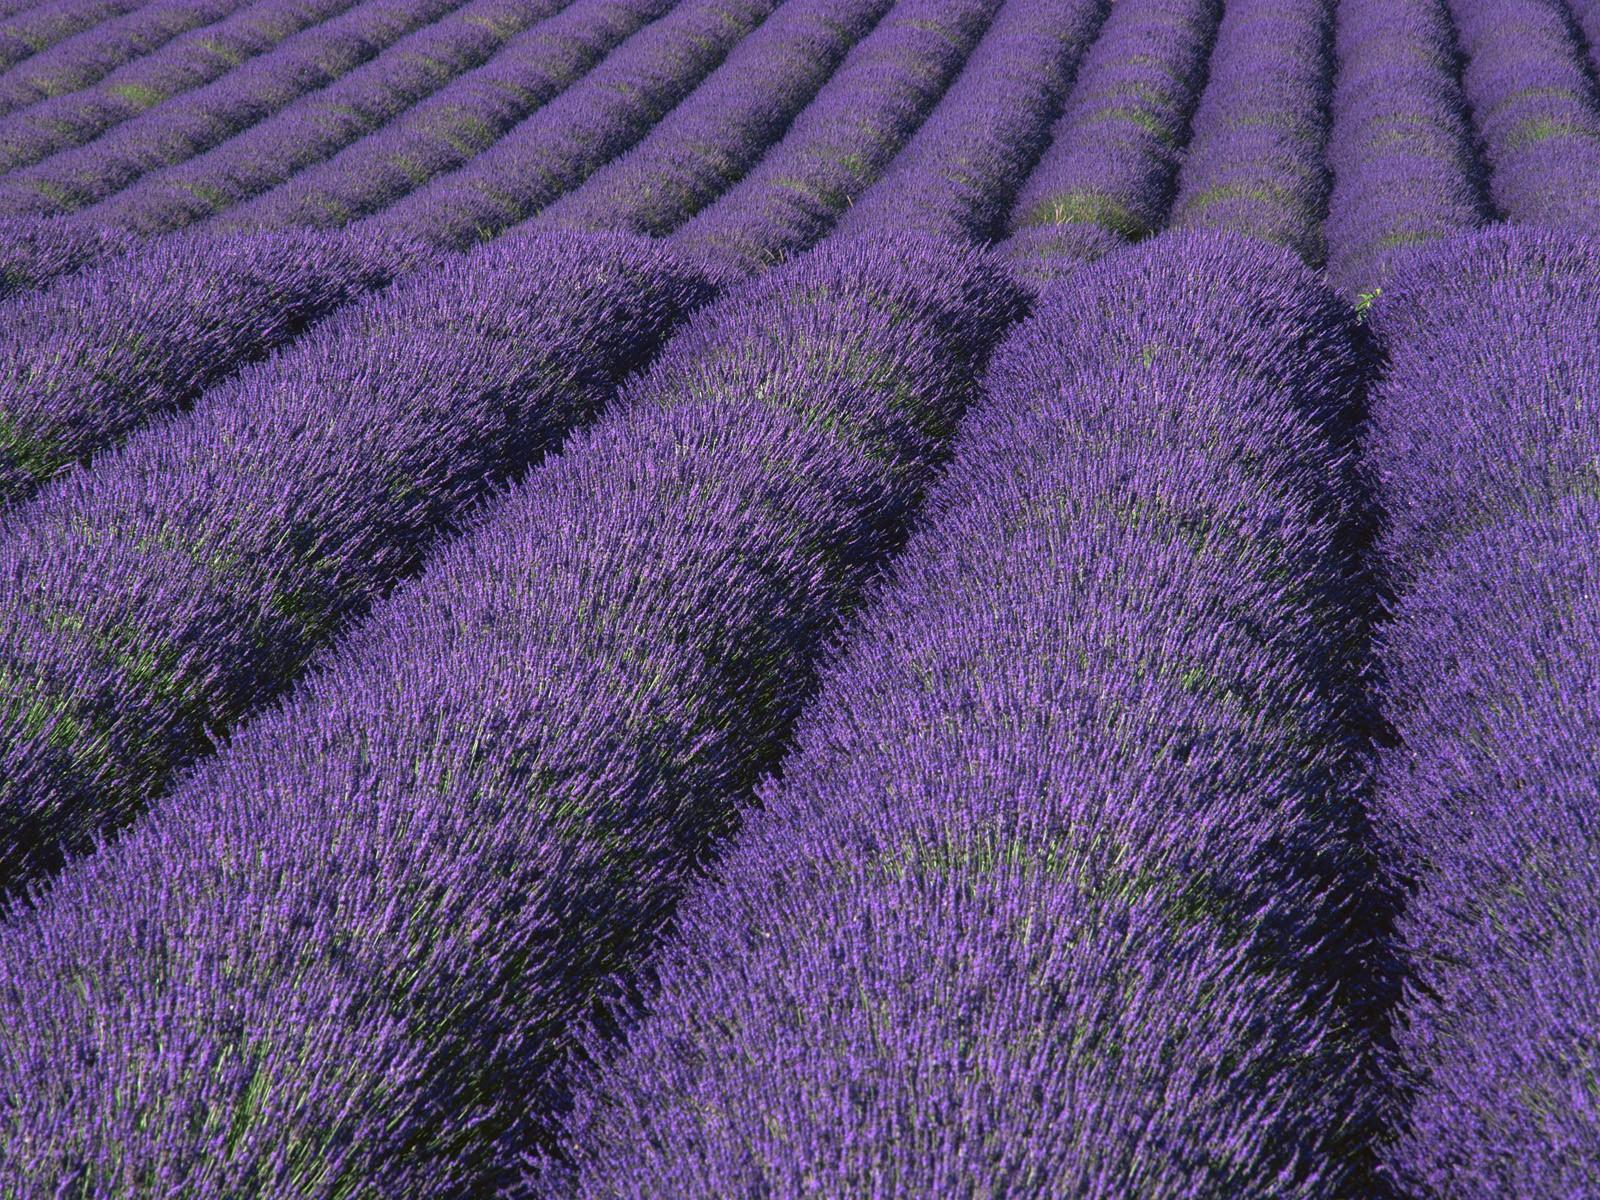 Lavender Wallpaper 1600x1200 Lavender 1600x1200